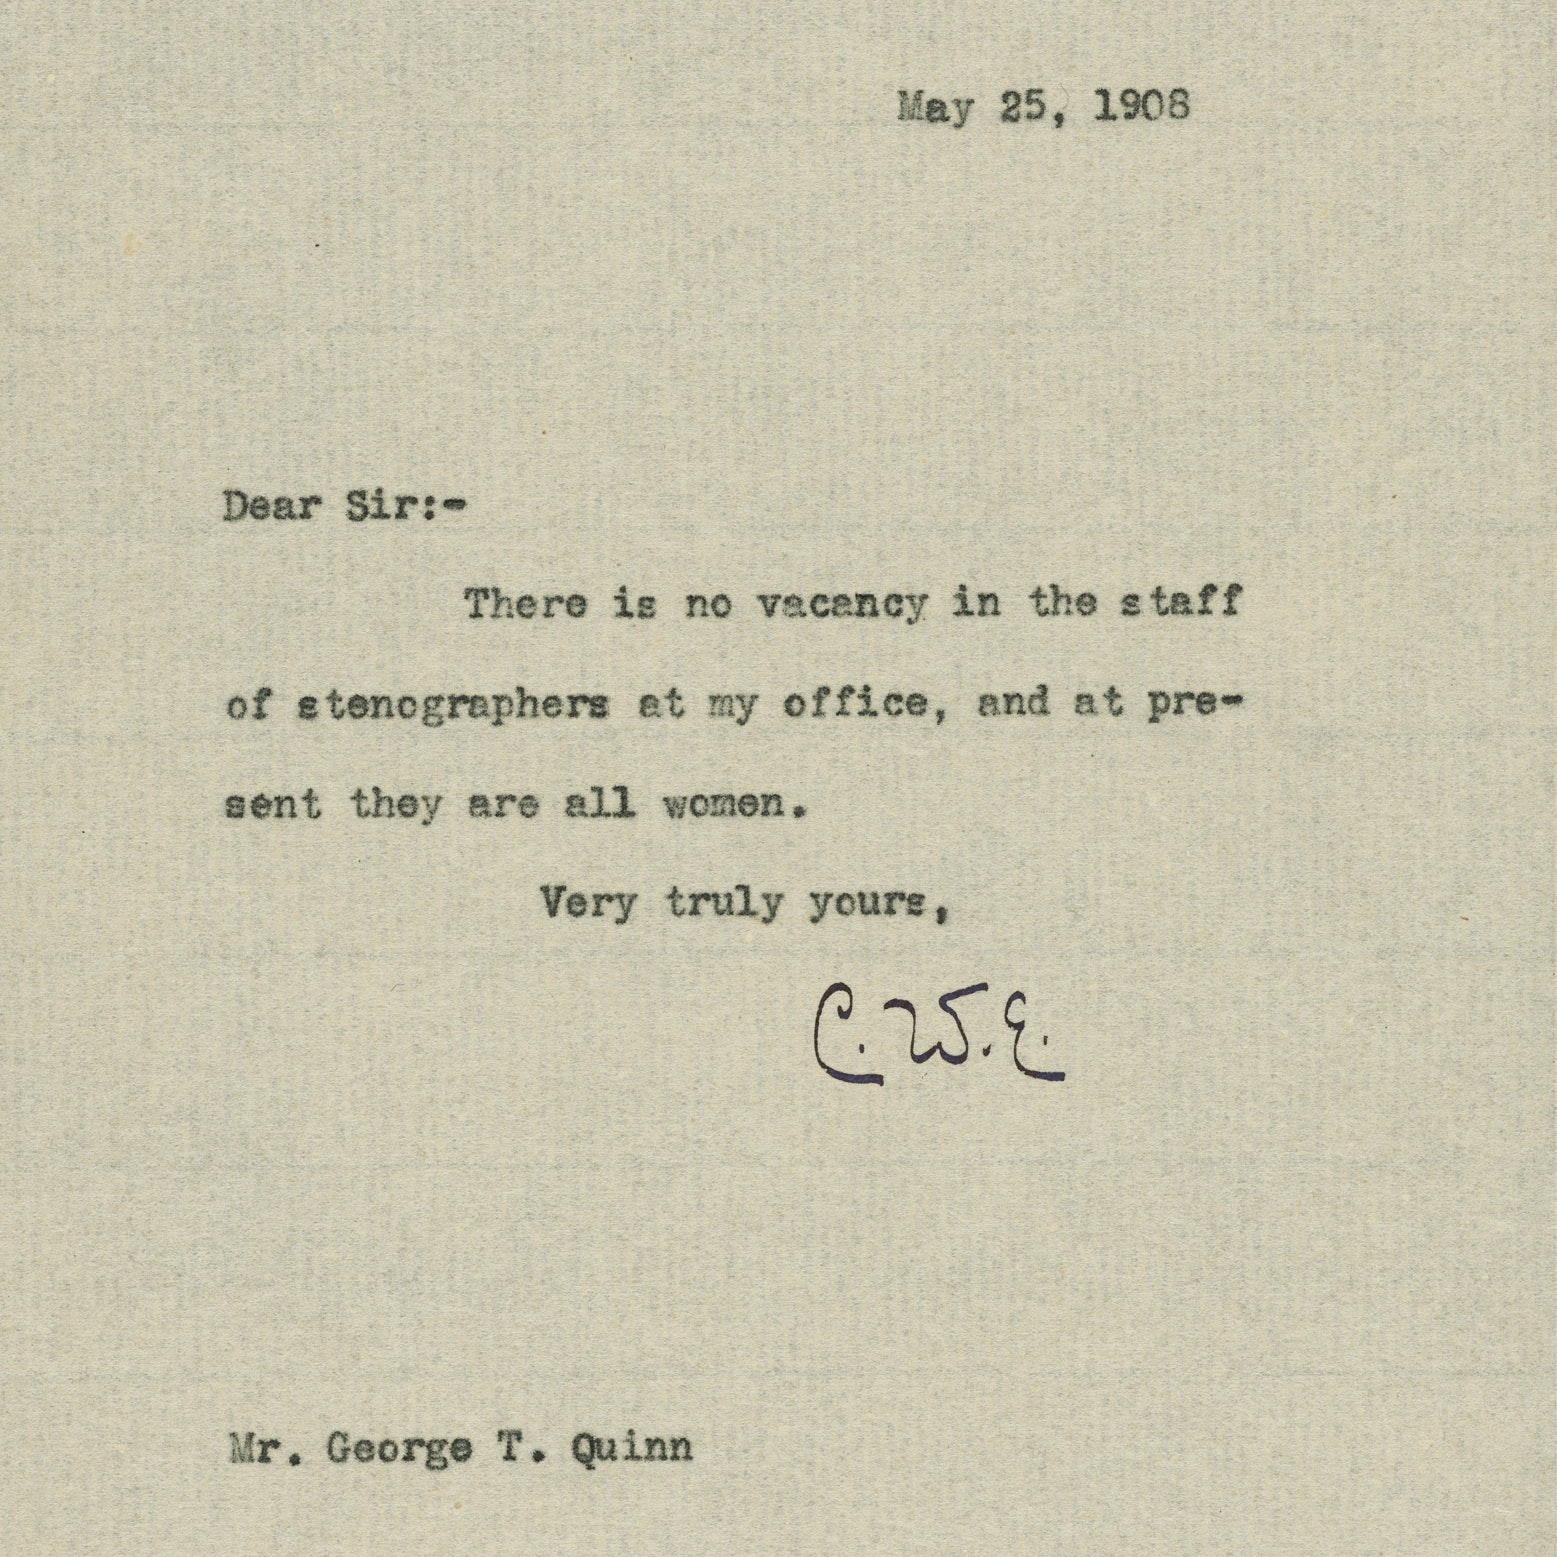 Letter regarding steno pool employment